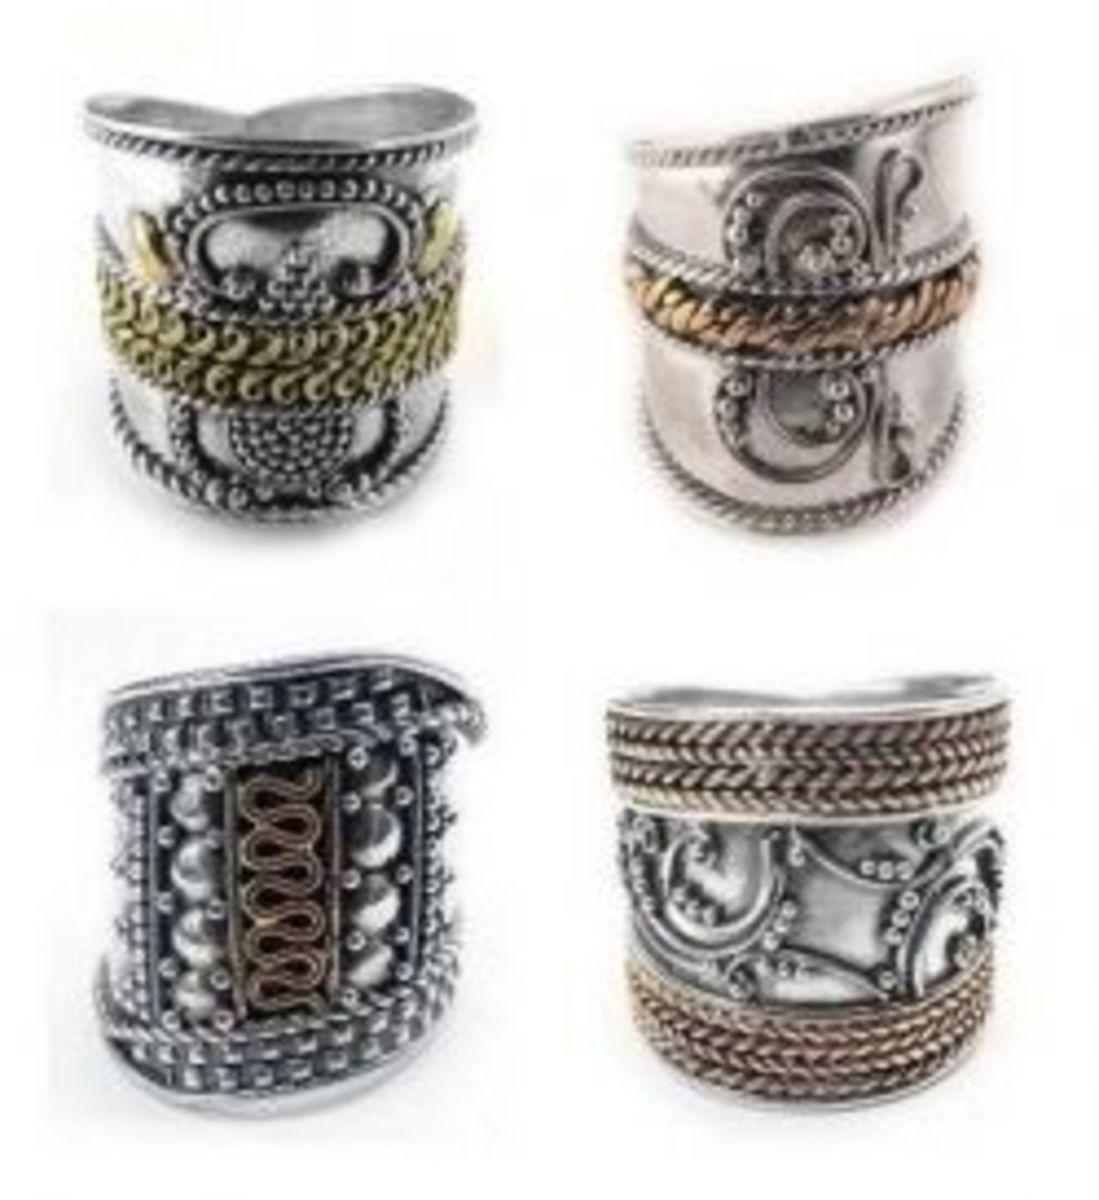 Medievel-Armor-Rings